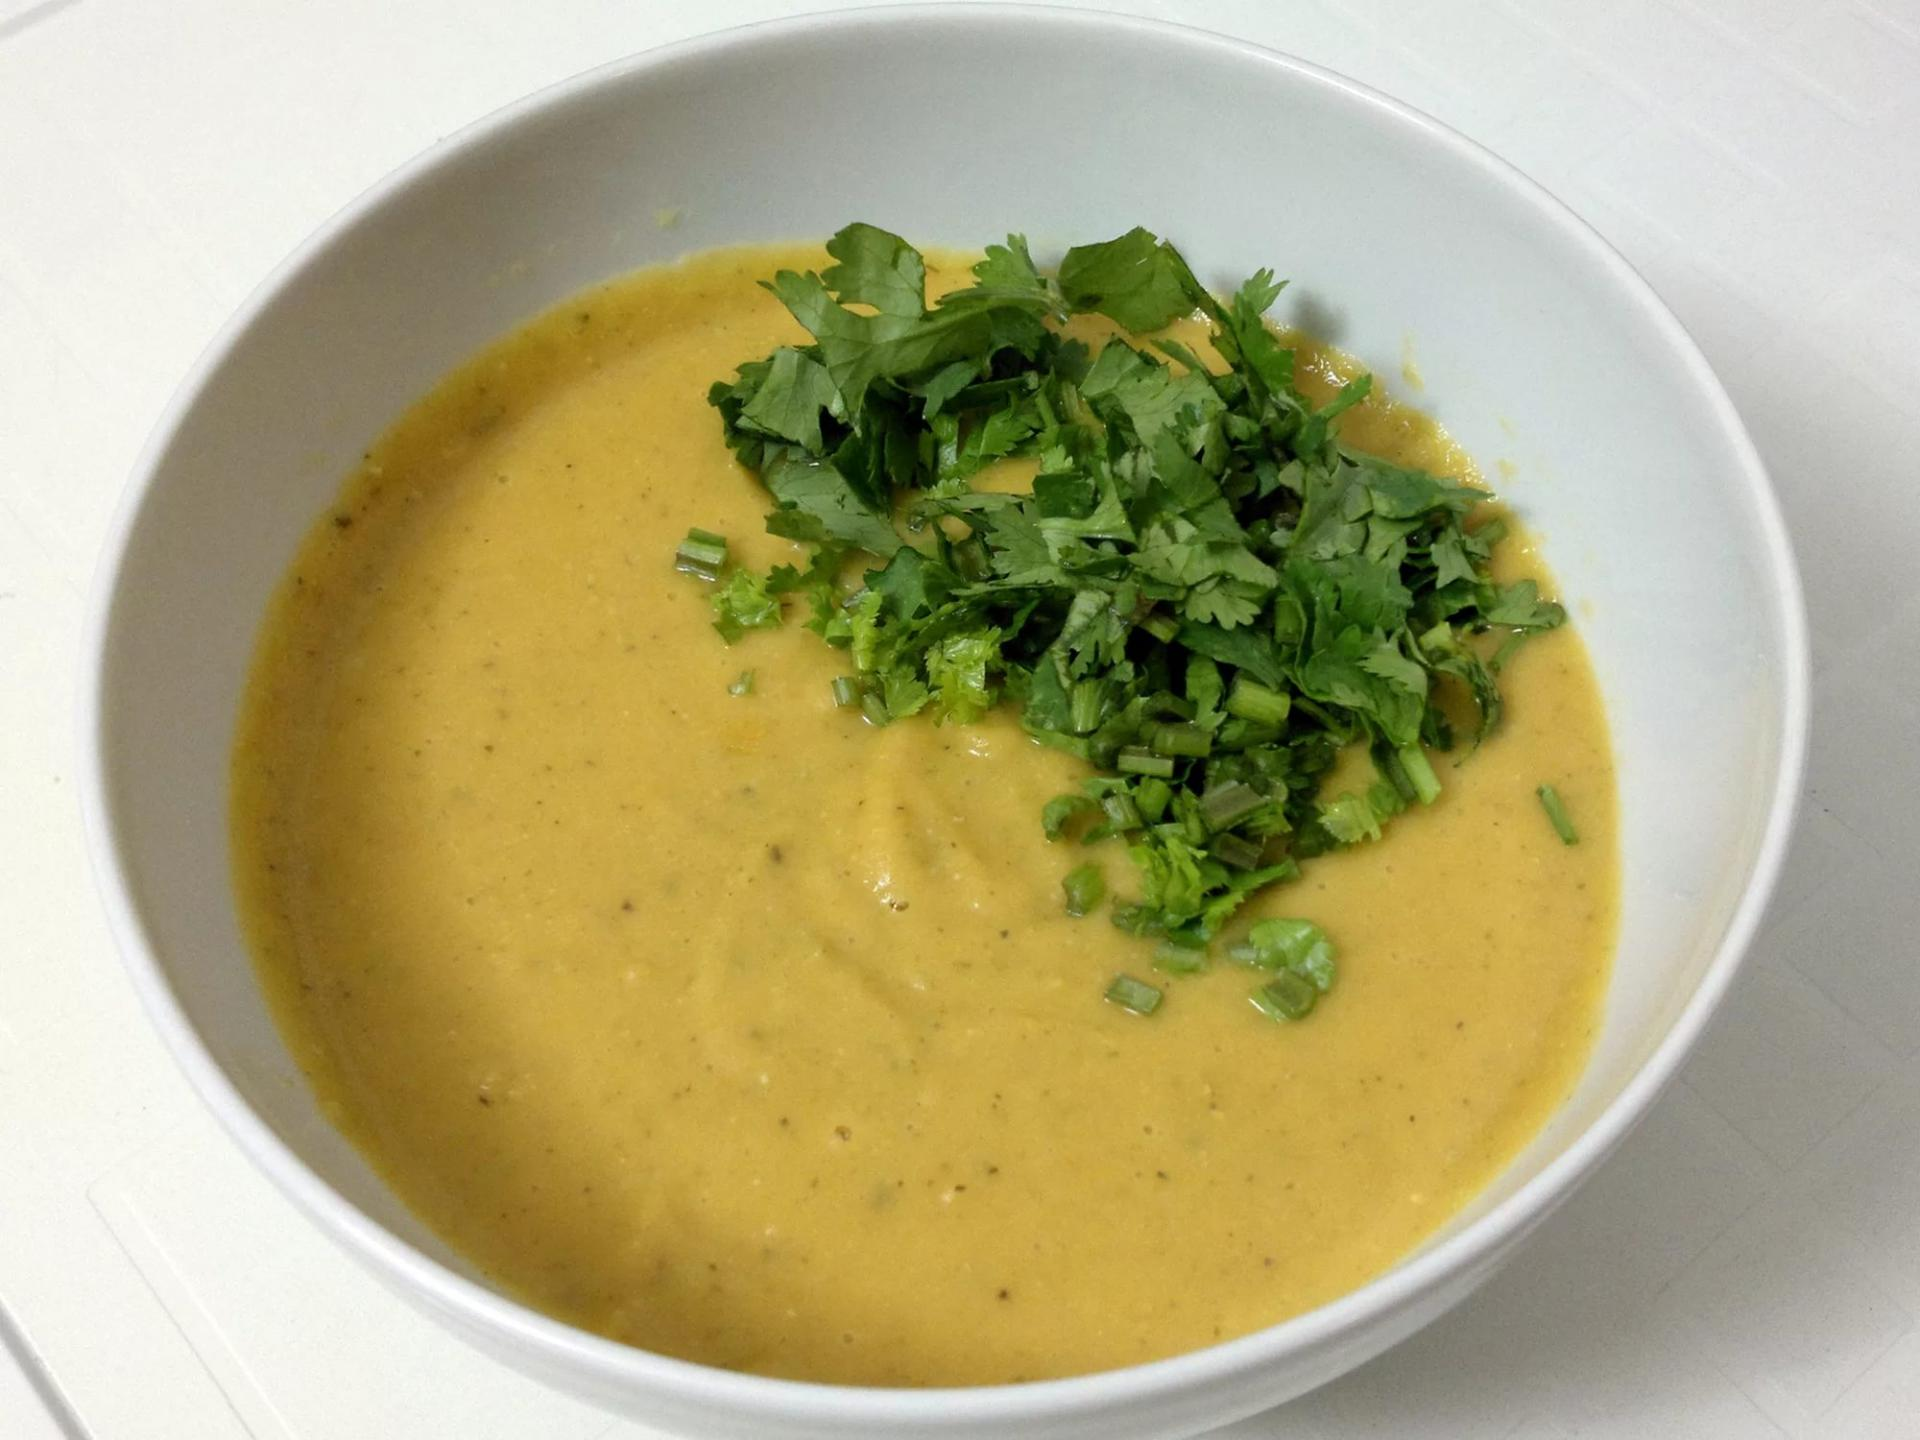 супа-пюре из чечевицы